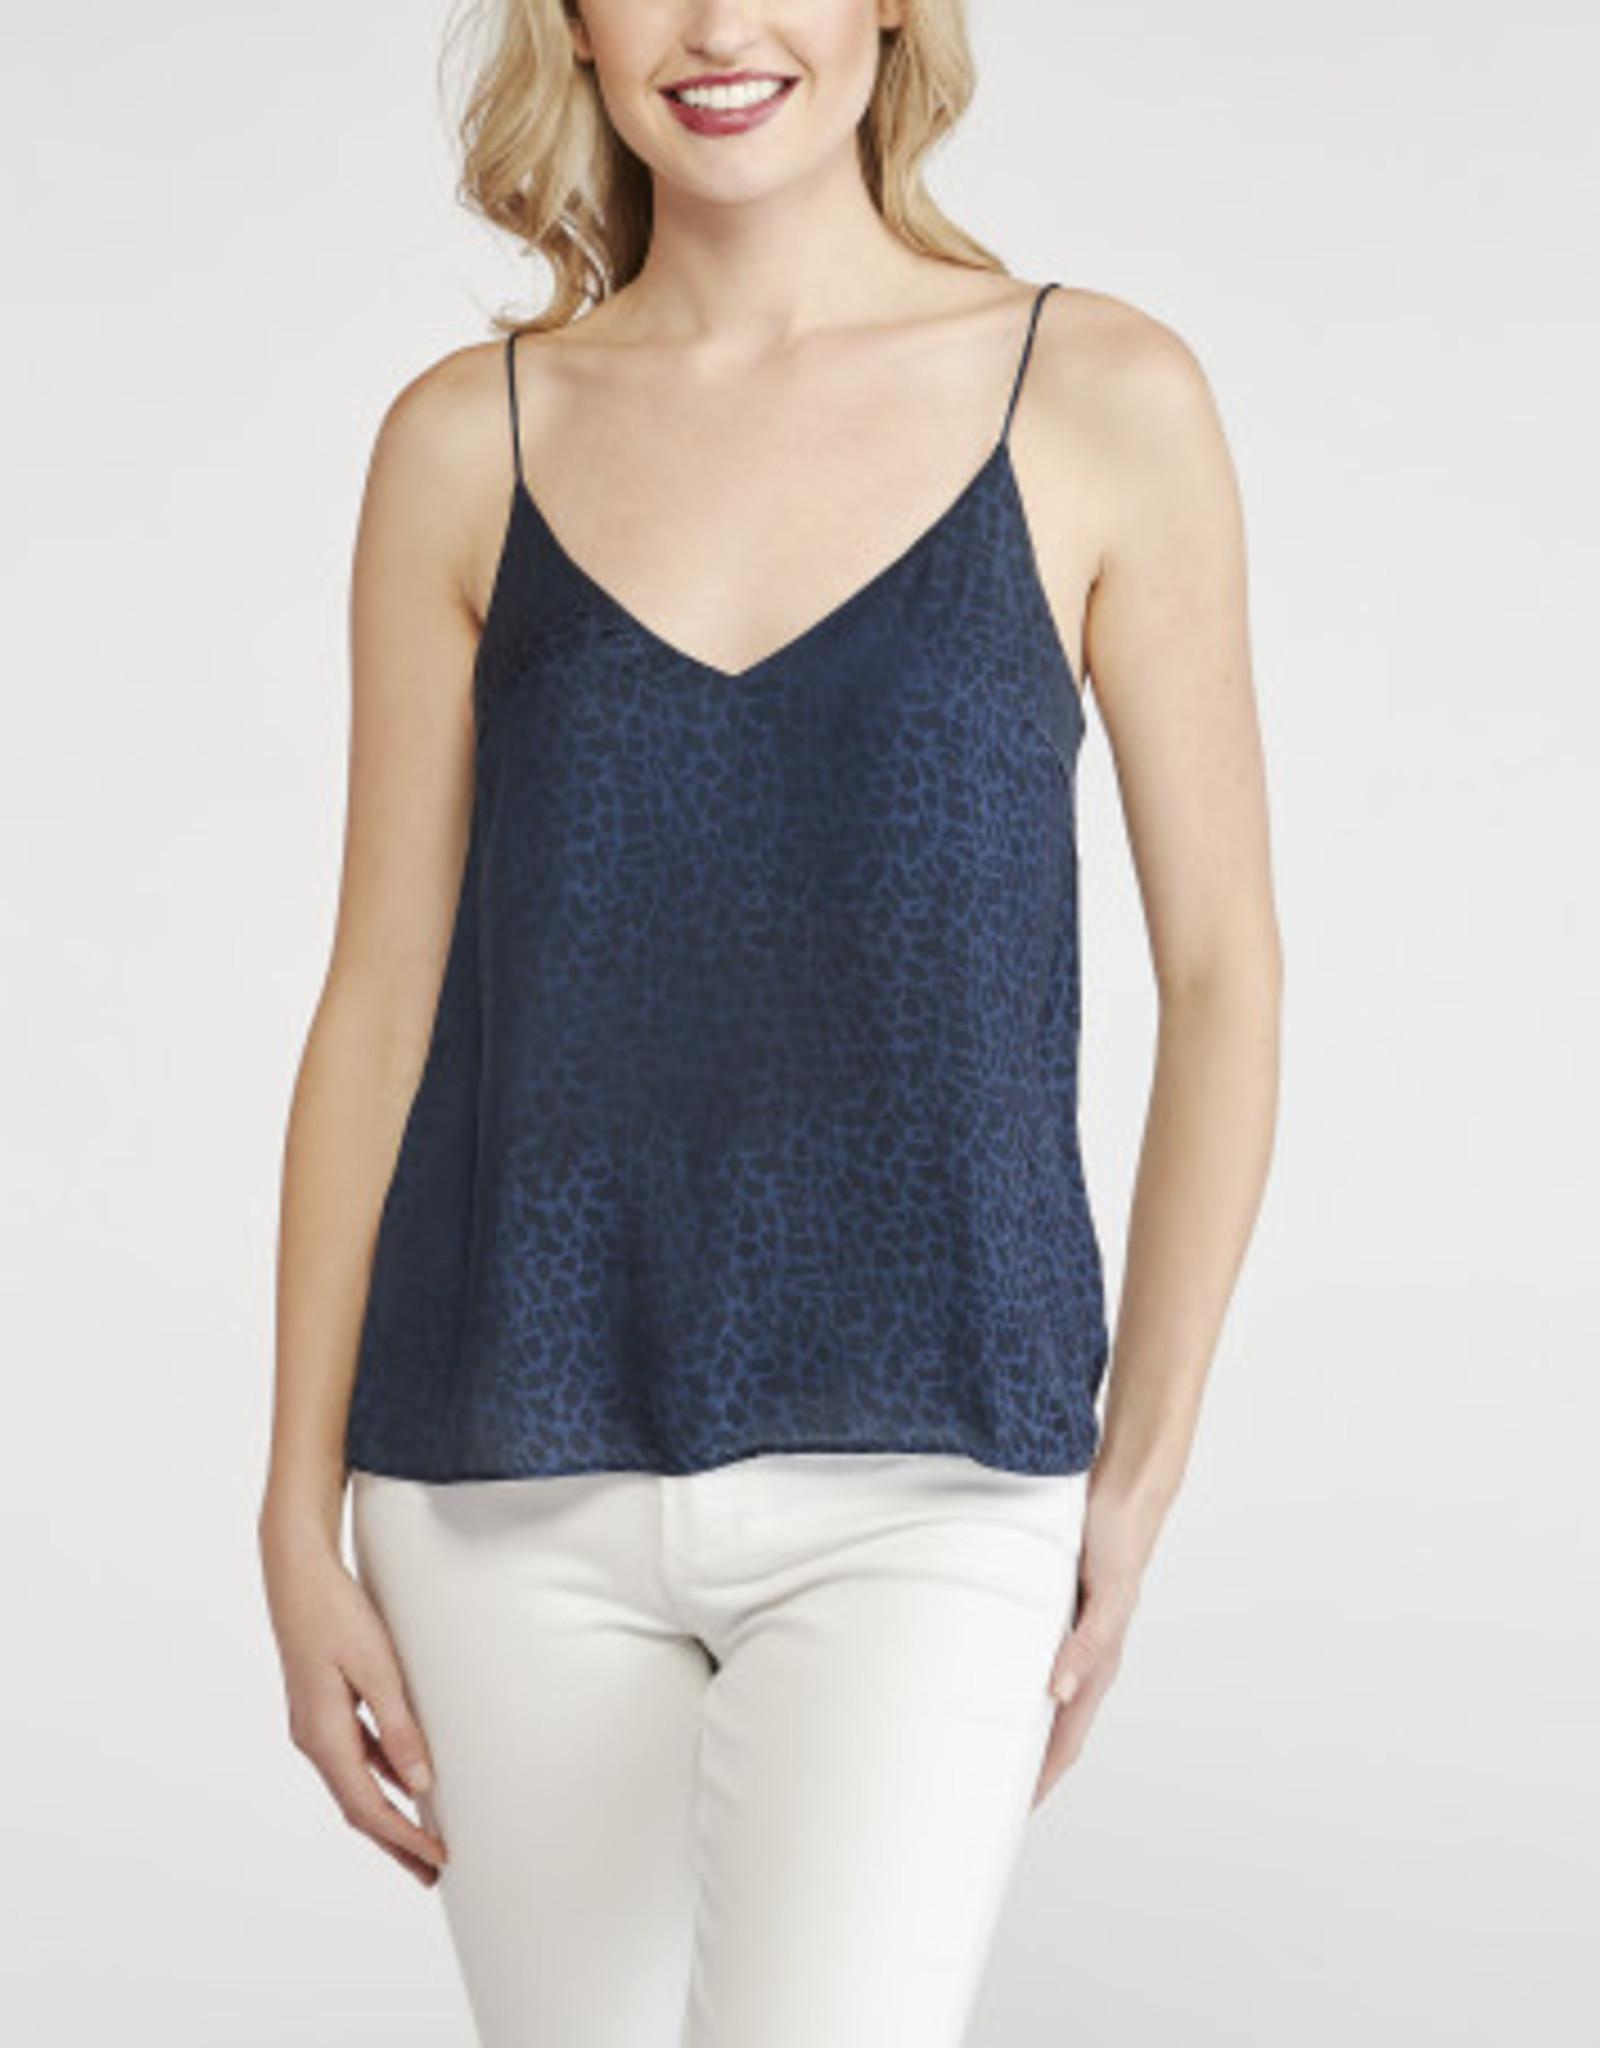 Dex Bros Clothing Co Ltd. Blouse Cami